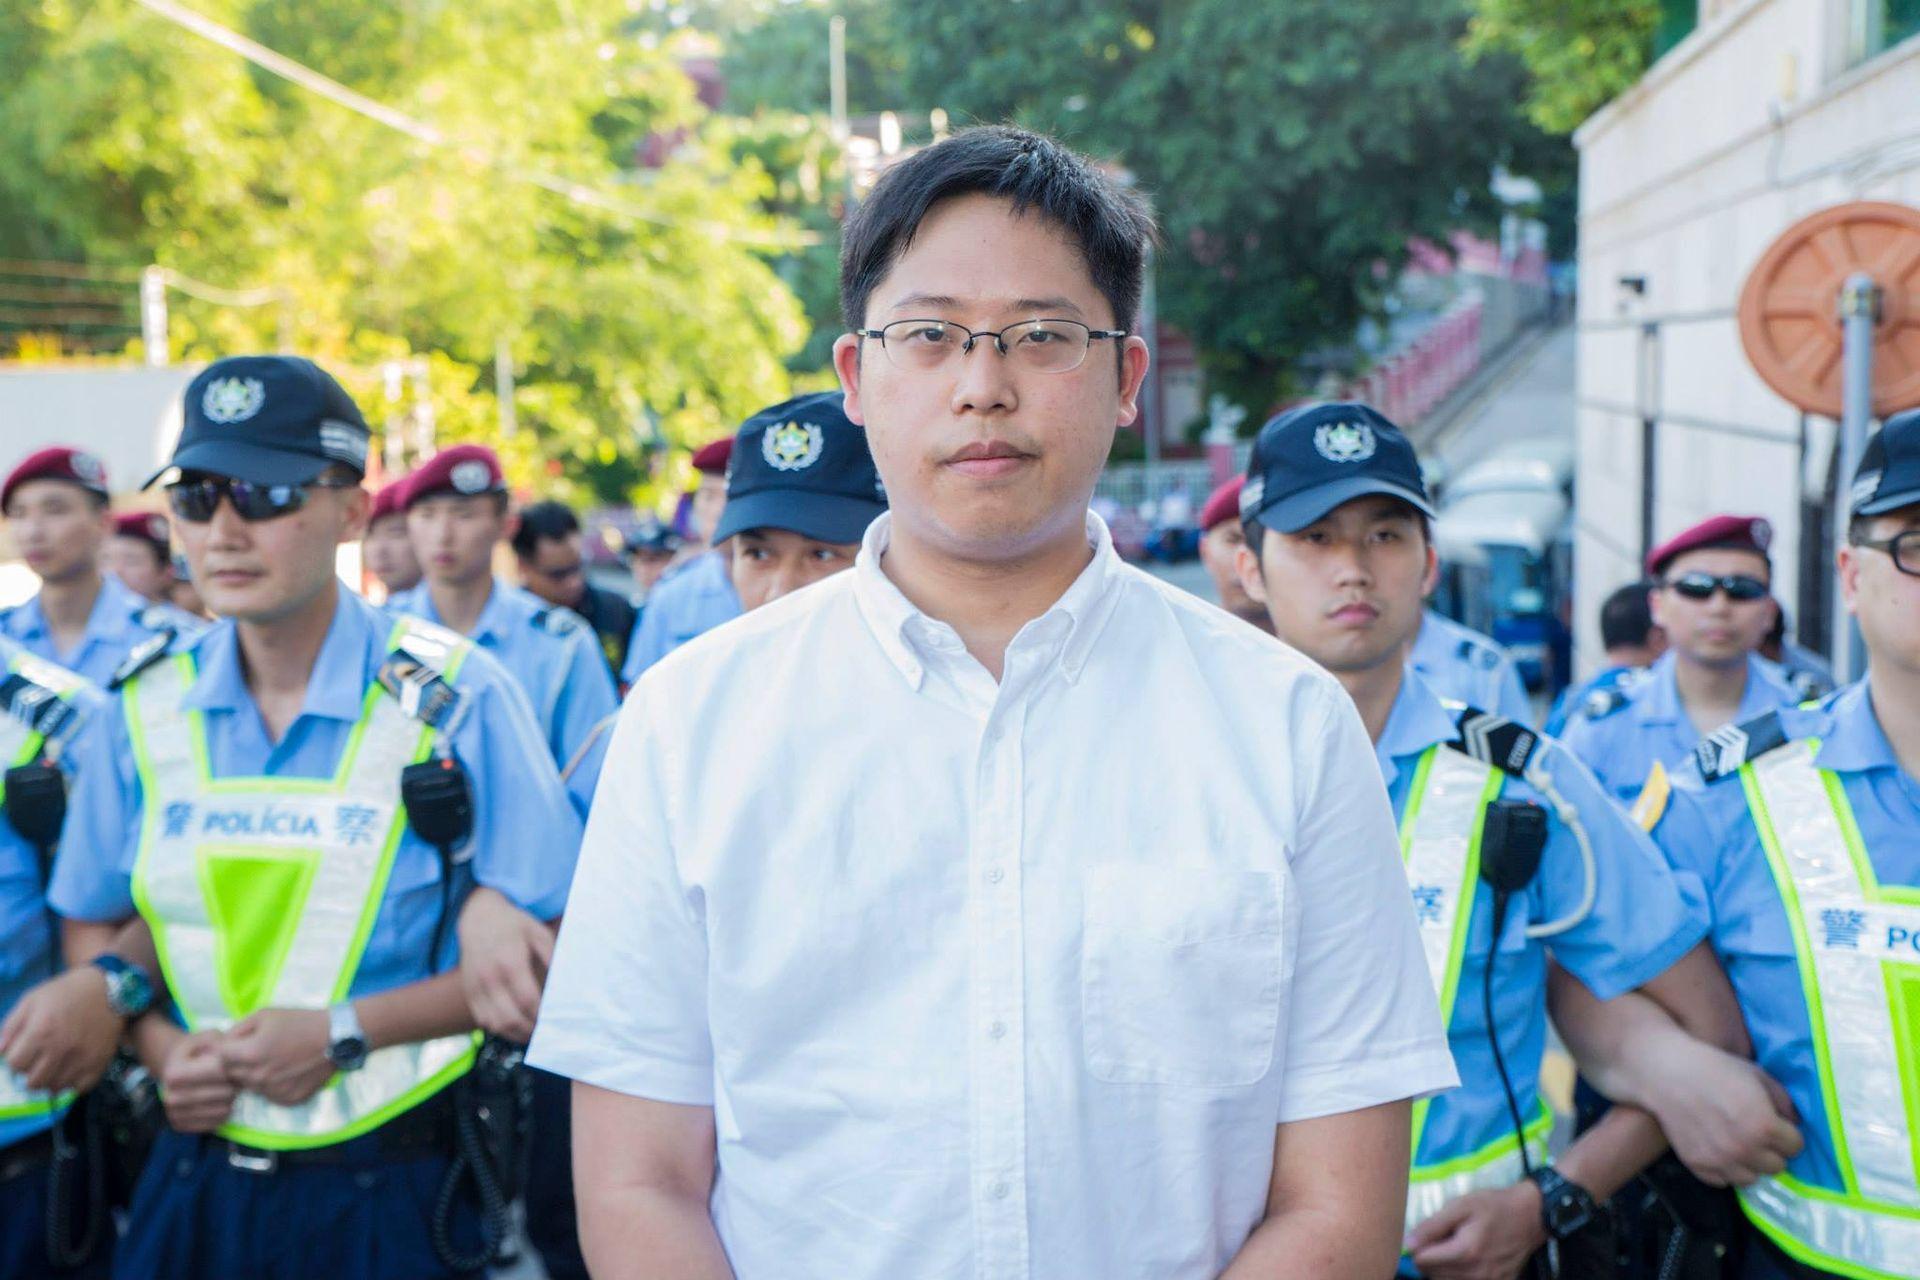 Vigília   Jason Chao fala de abuso de poder por parte das autoridades